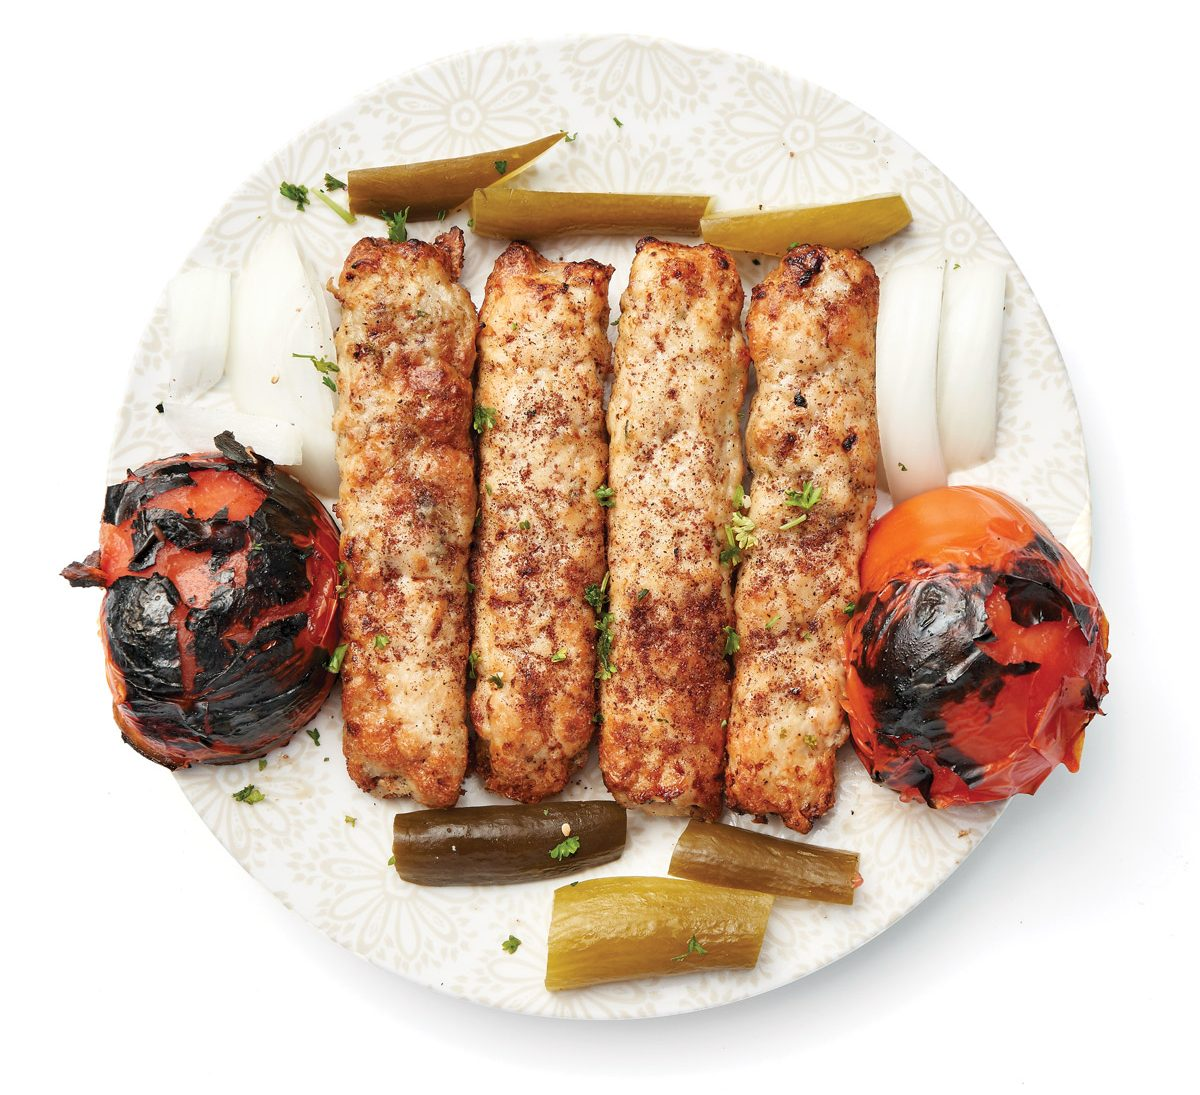 Ground-chicken shish kebab